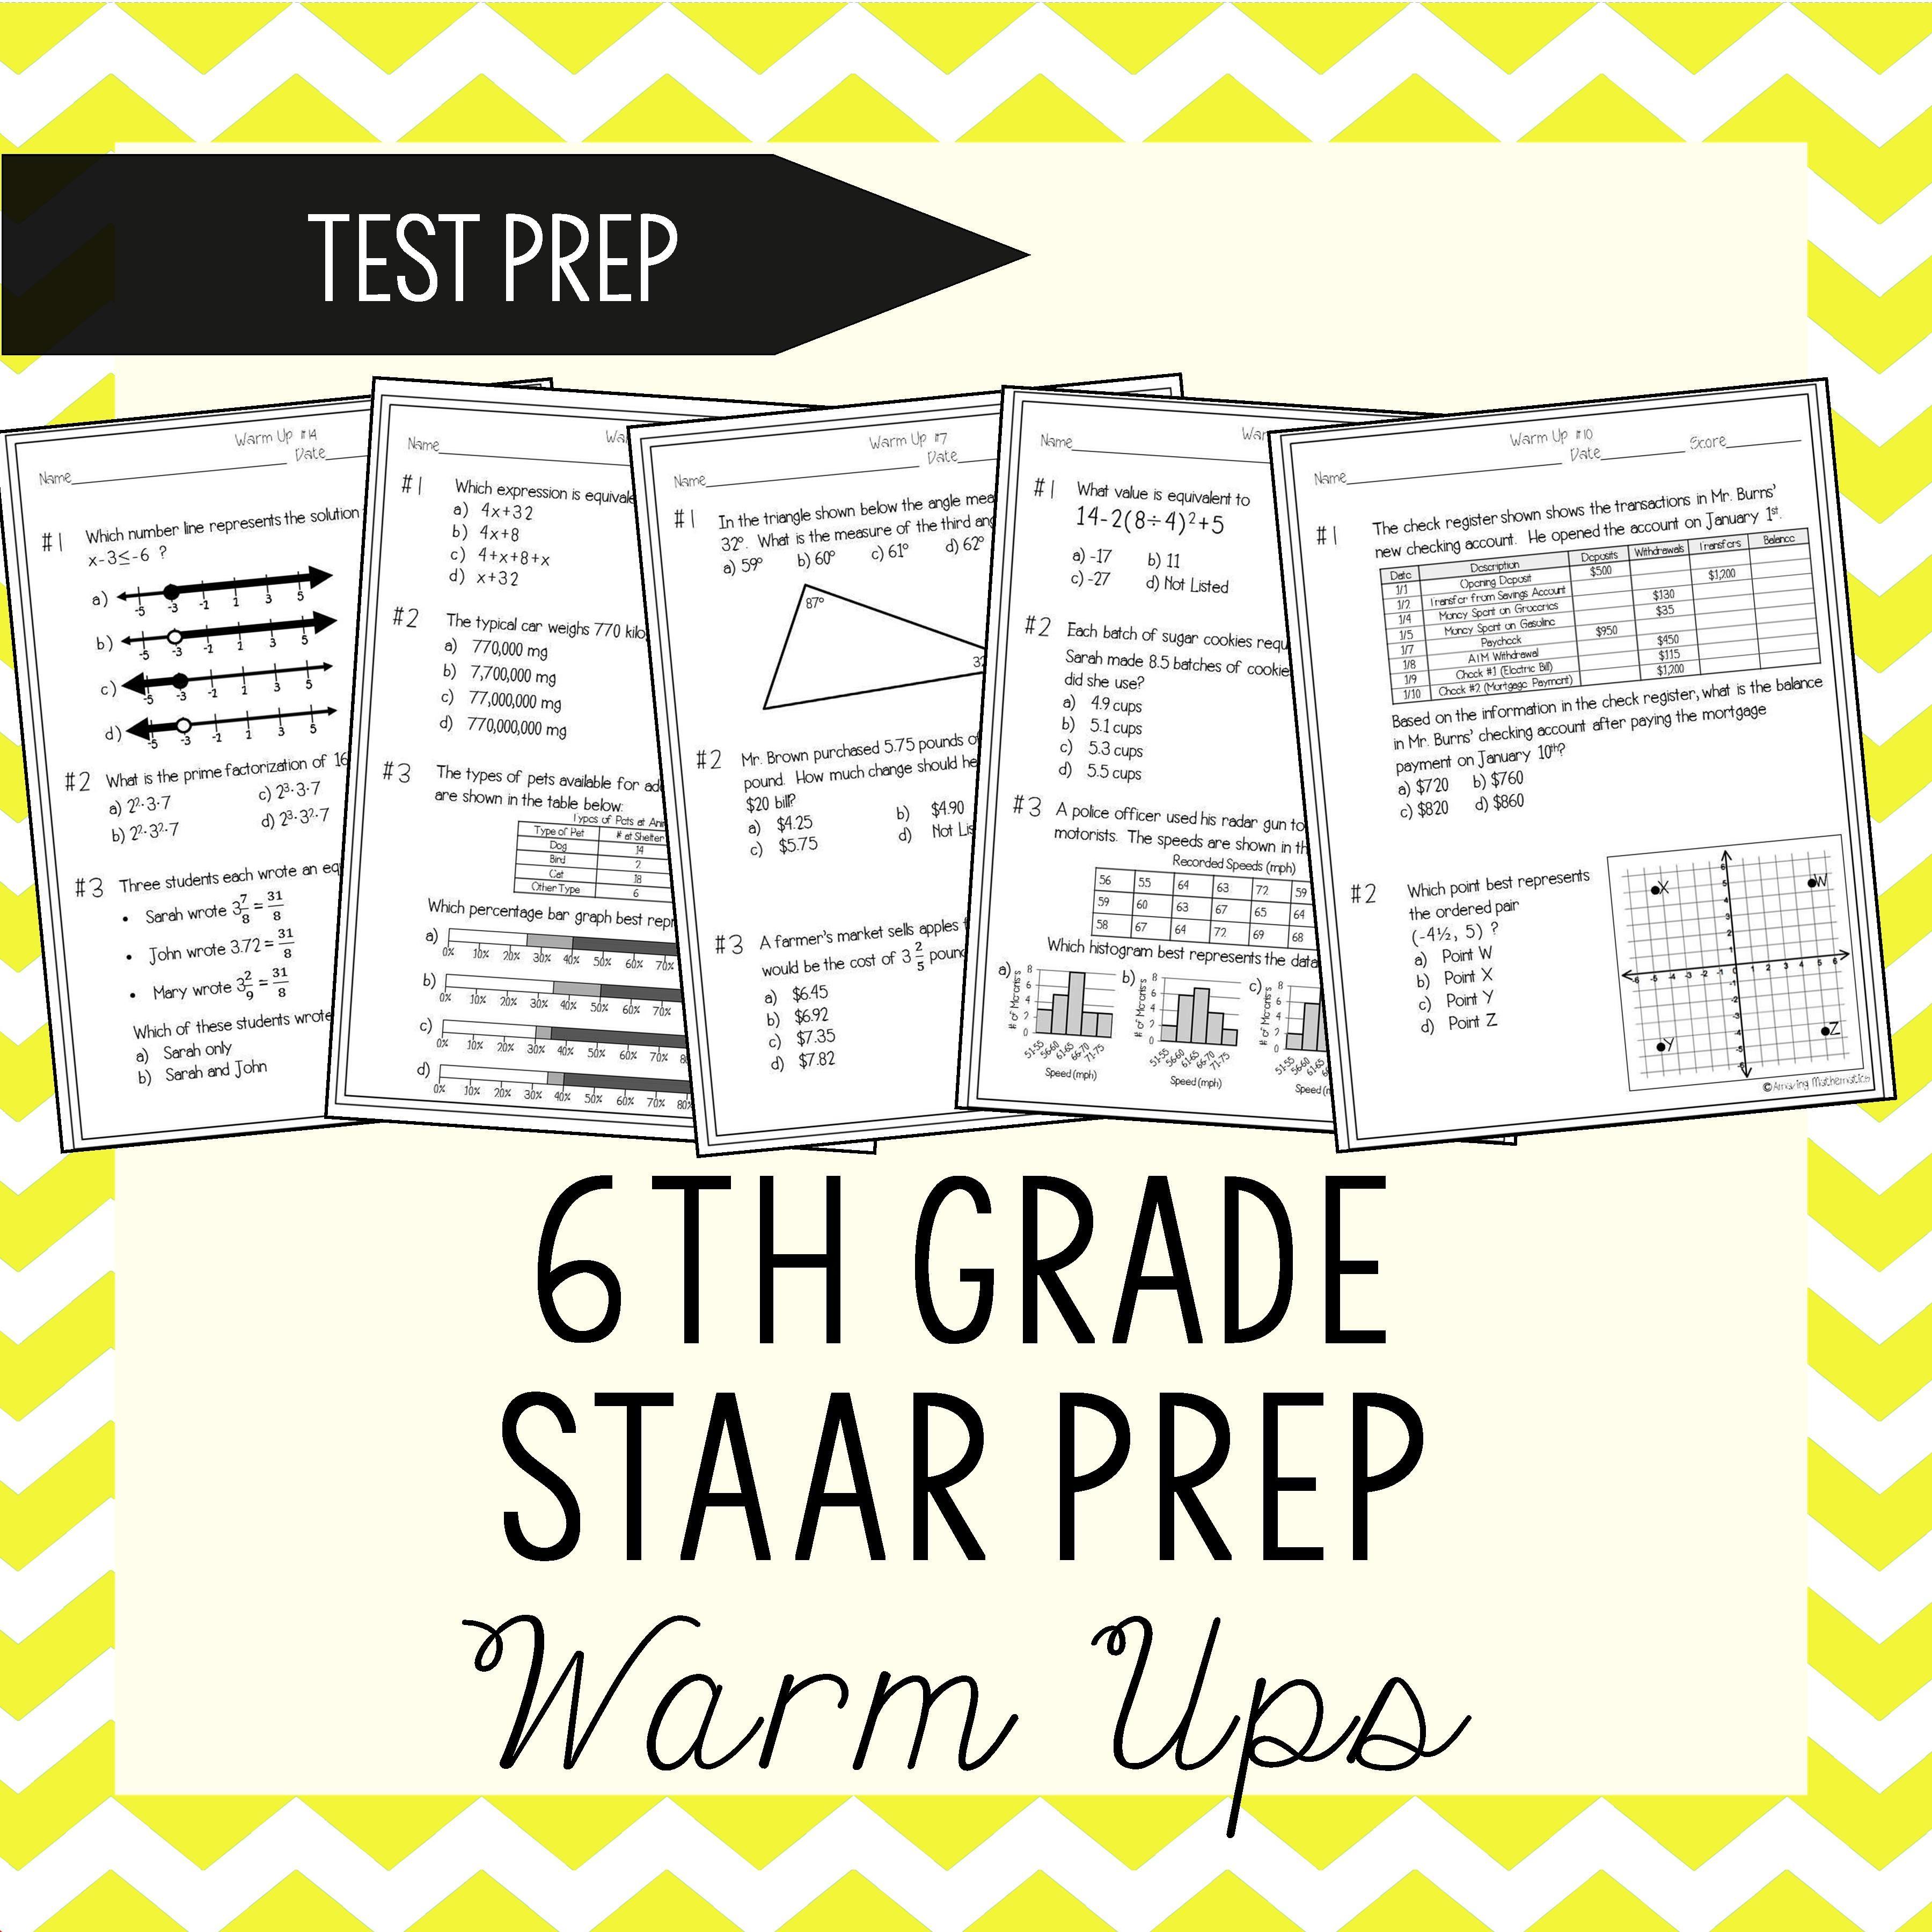 6th Grade Math Warm Ups Staar Review Prep 6th Grade Staar Prep